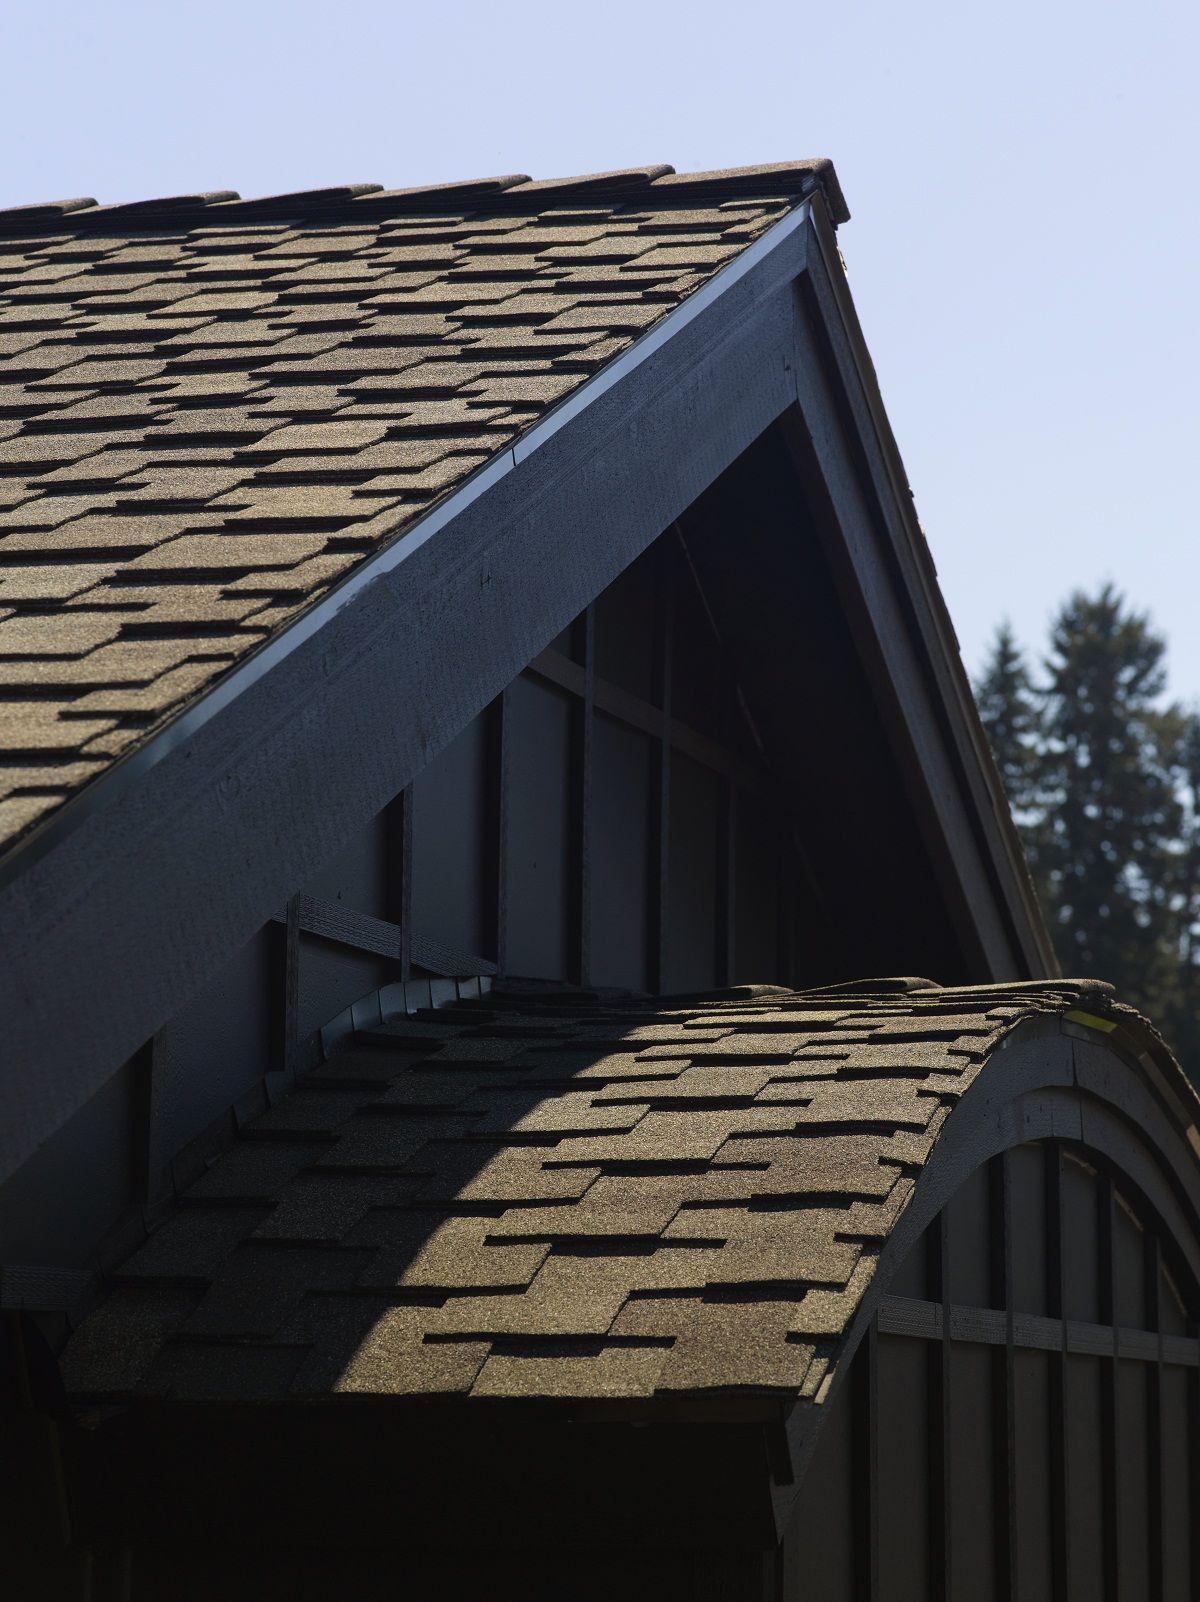 Best Presidential Shake Shingles Residential Roofing Roof 640 x 480